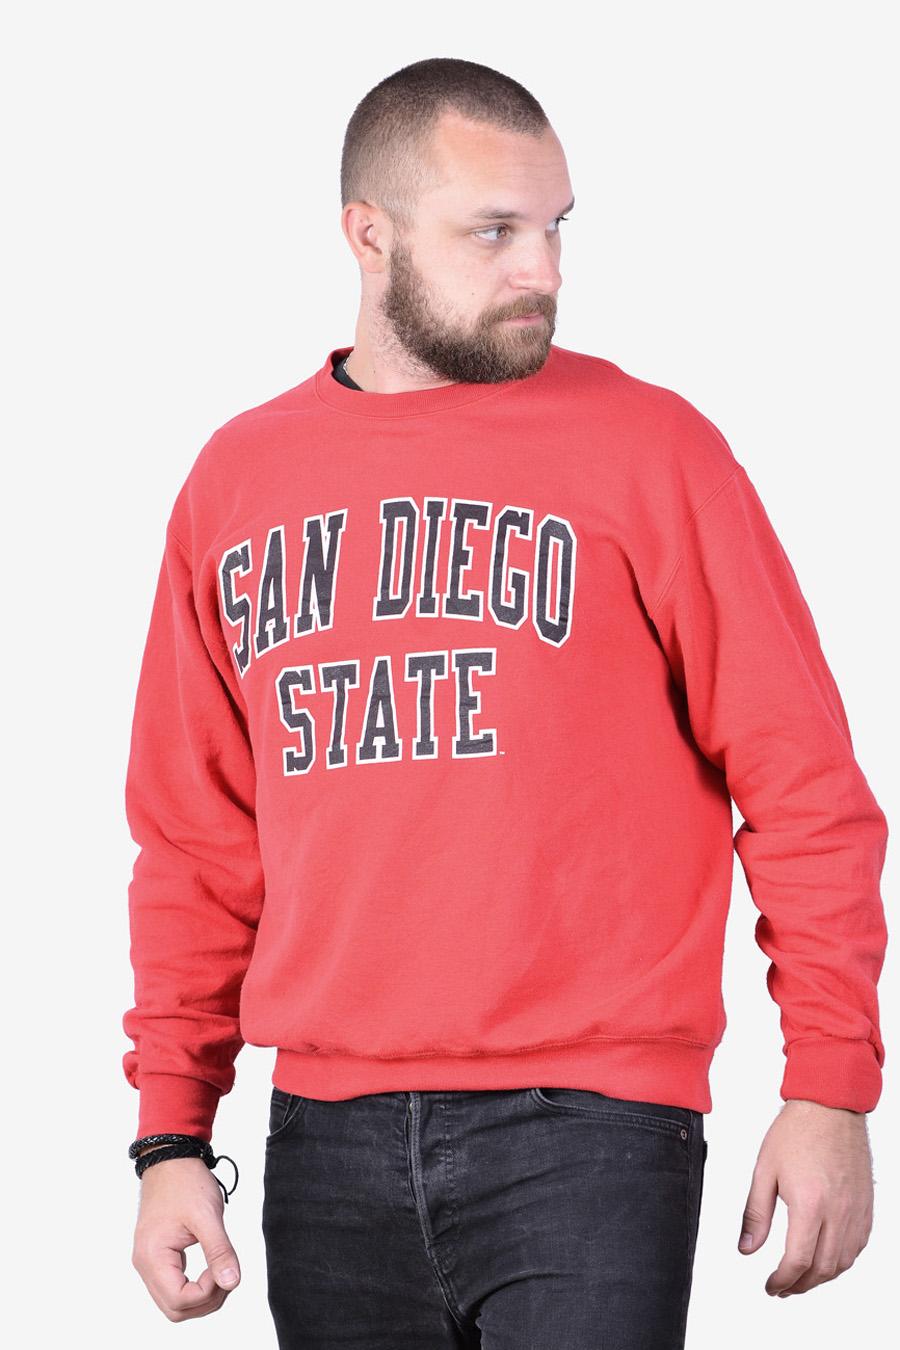 Vintage San Diego State sweatshirt